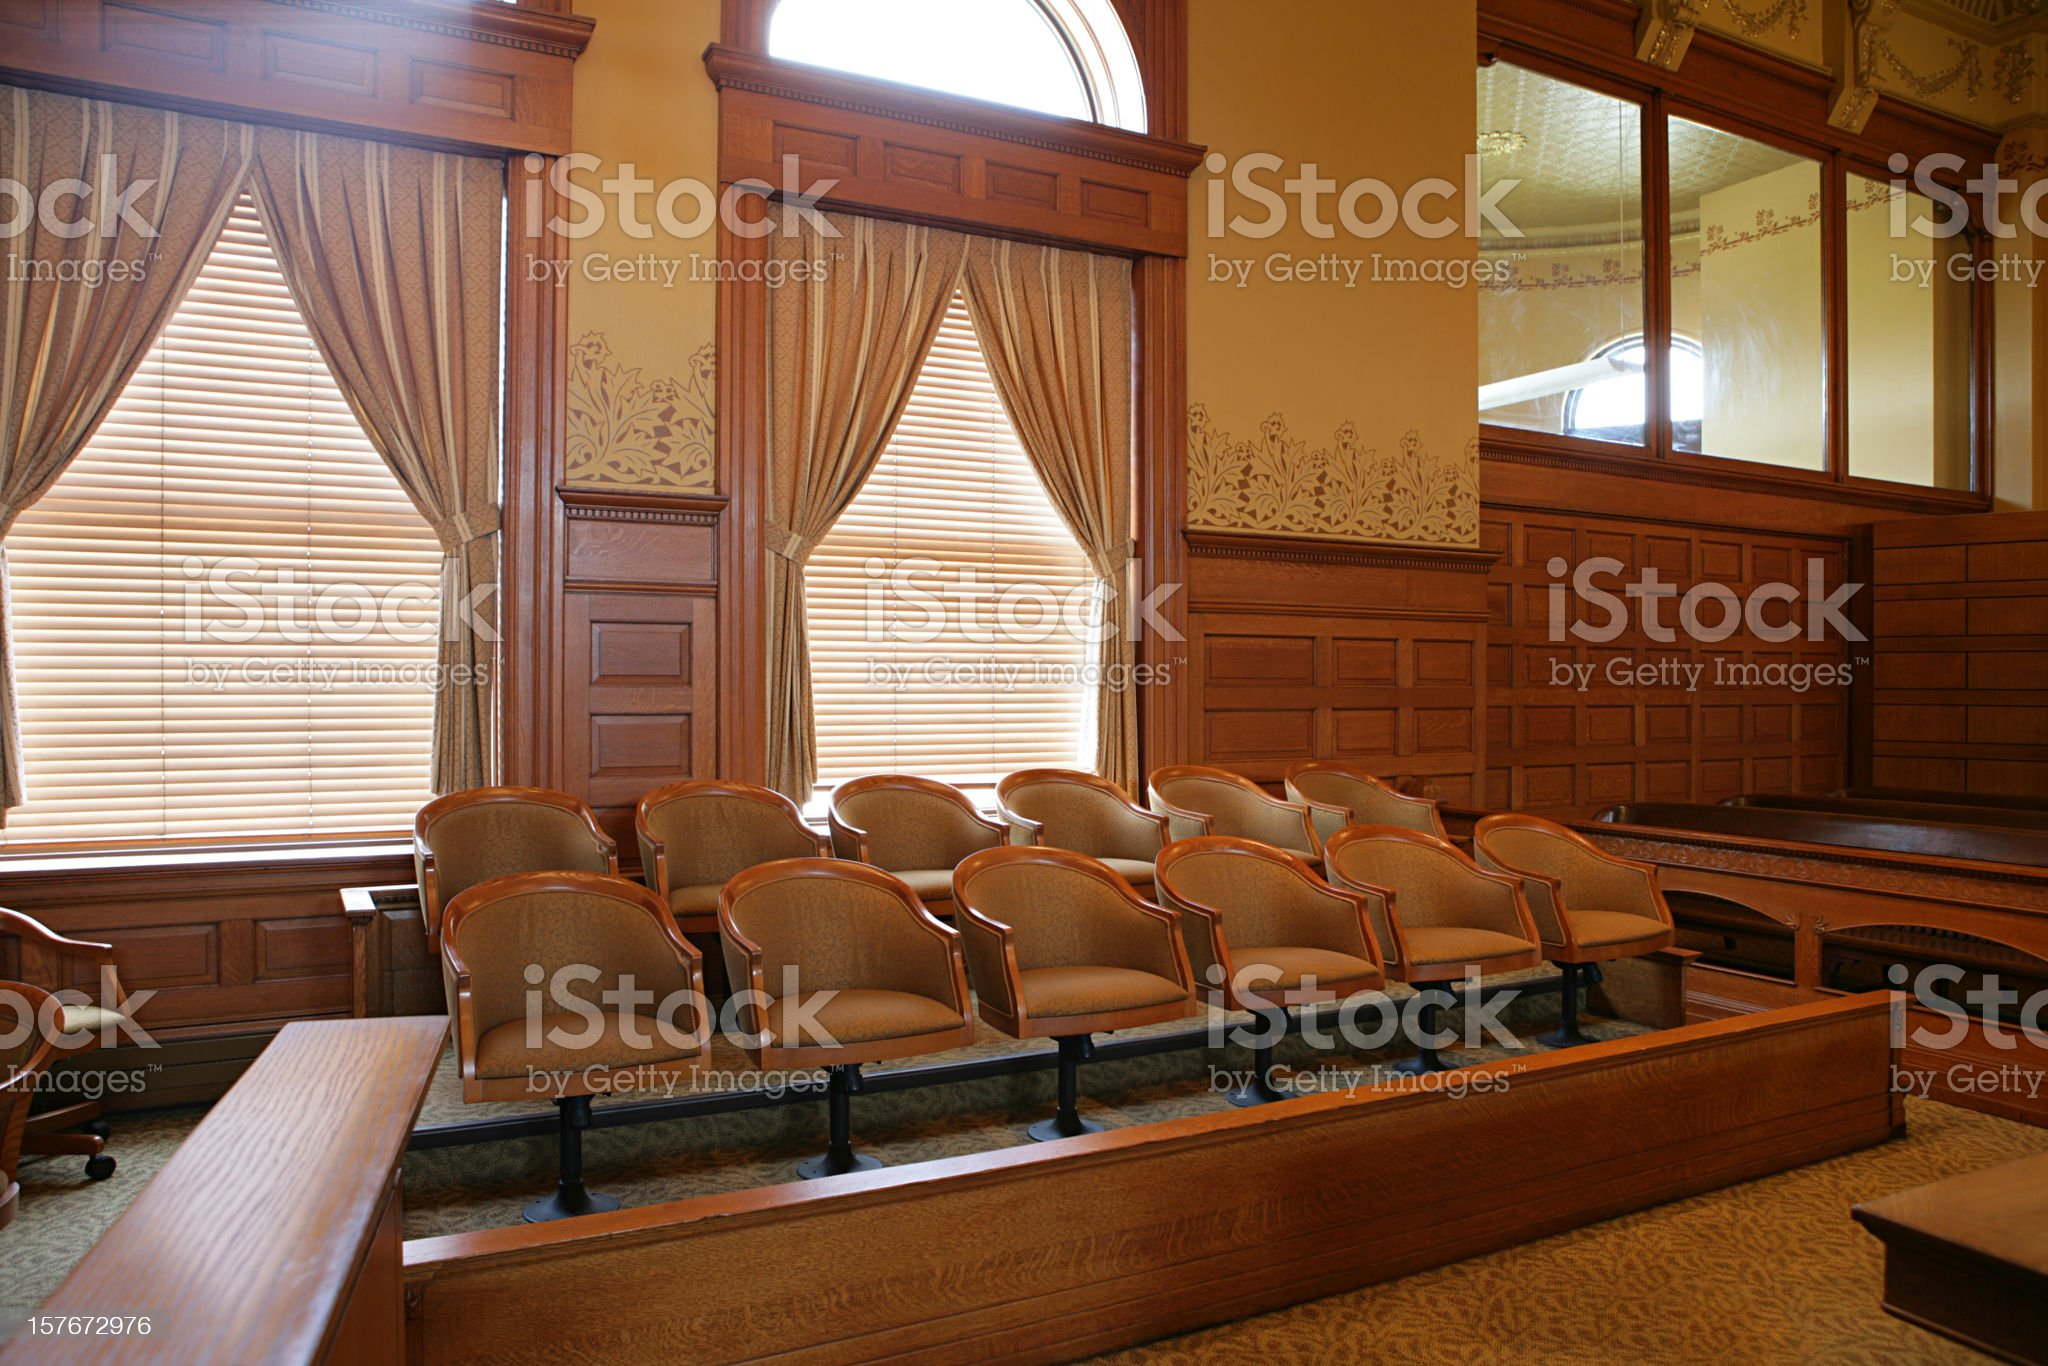 Jury Seats royalty-free stock photo